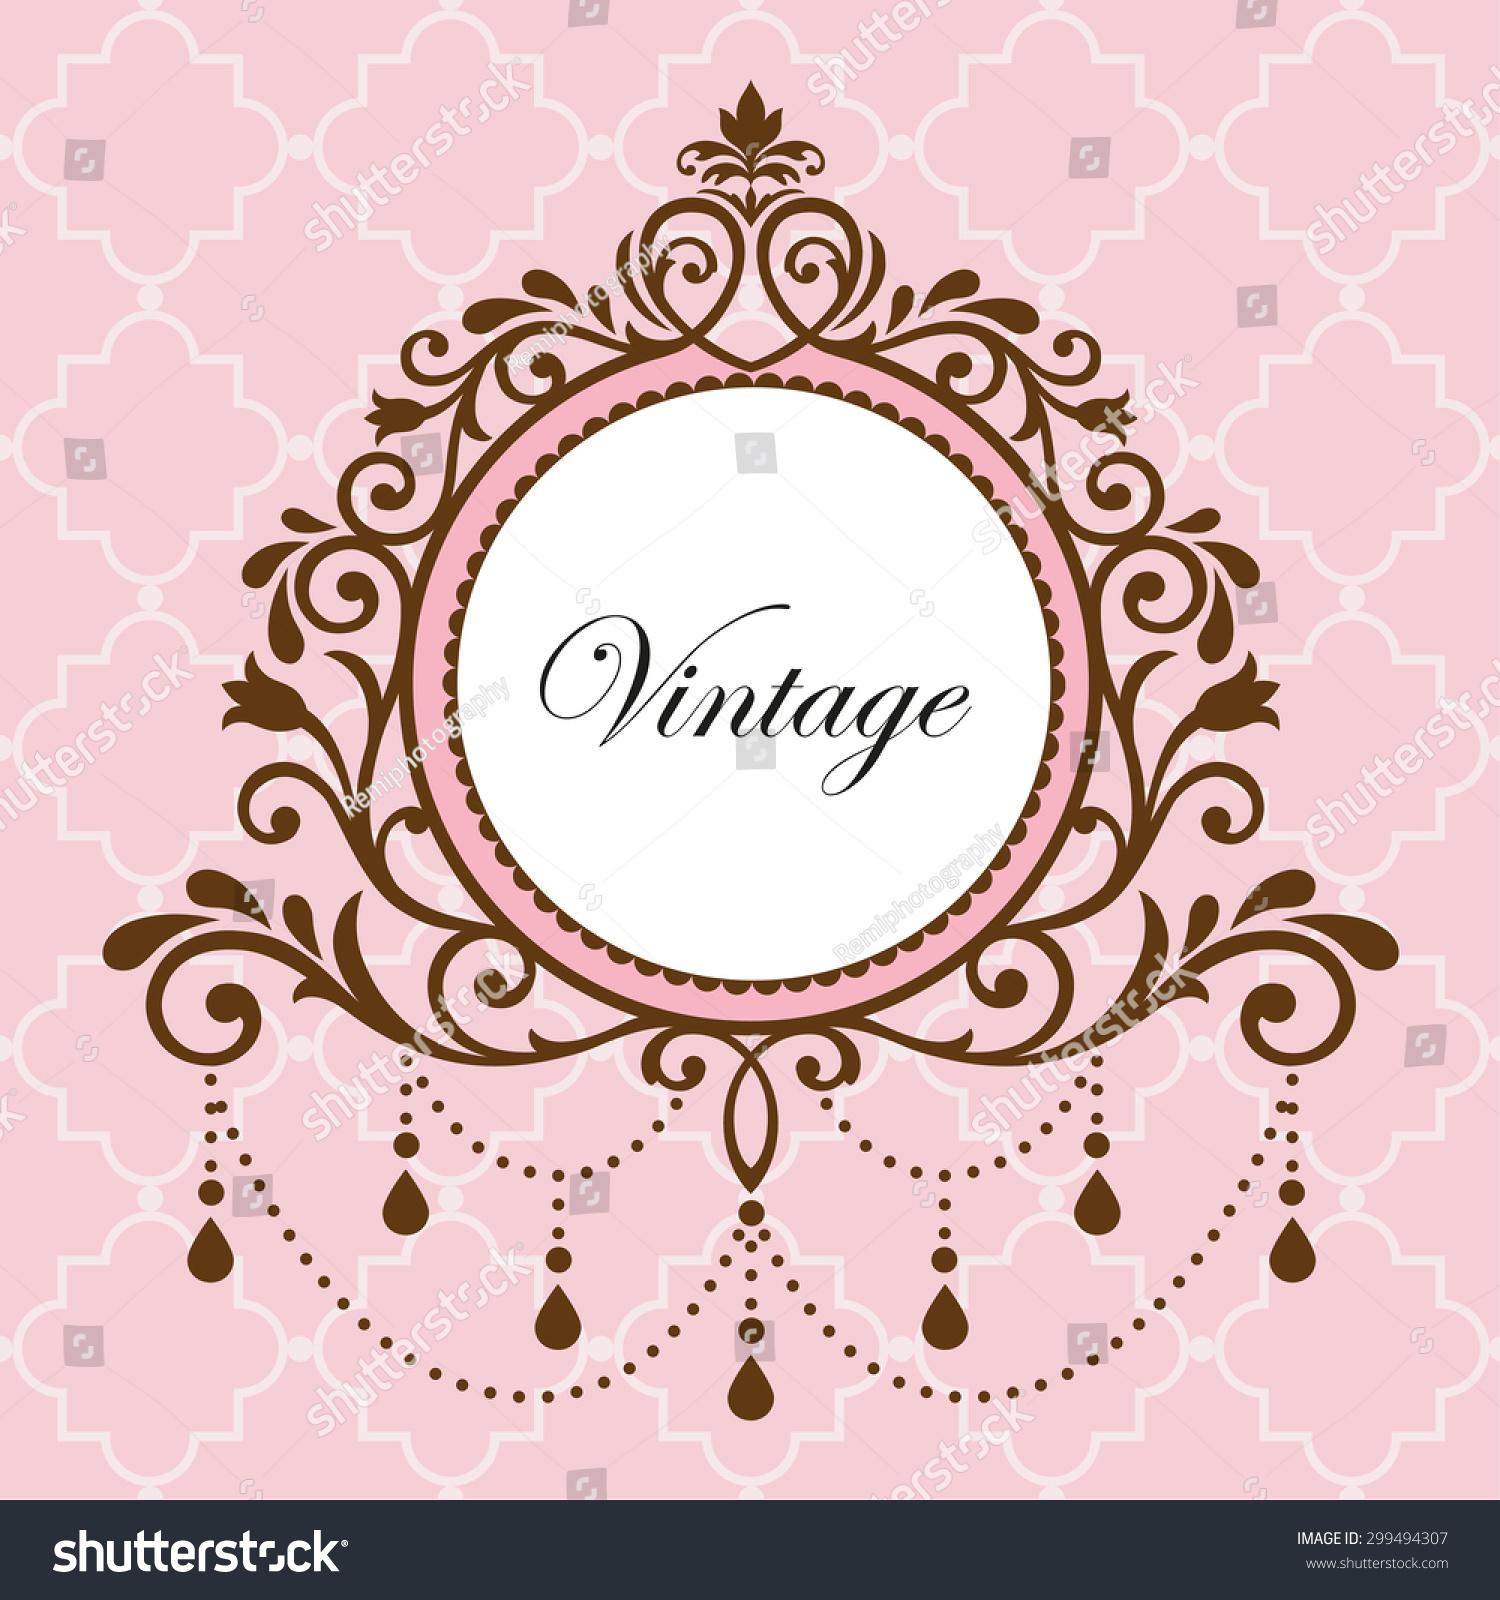 Chandelier vintage border frame on pink stock vector 299494307 chandelier vintage border frame on pink background arubaitofo Image collections